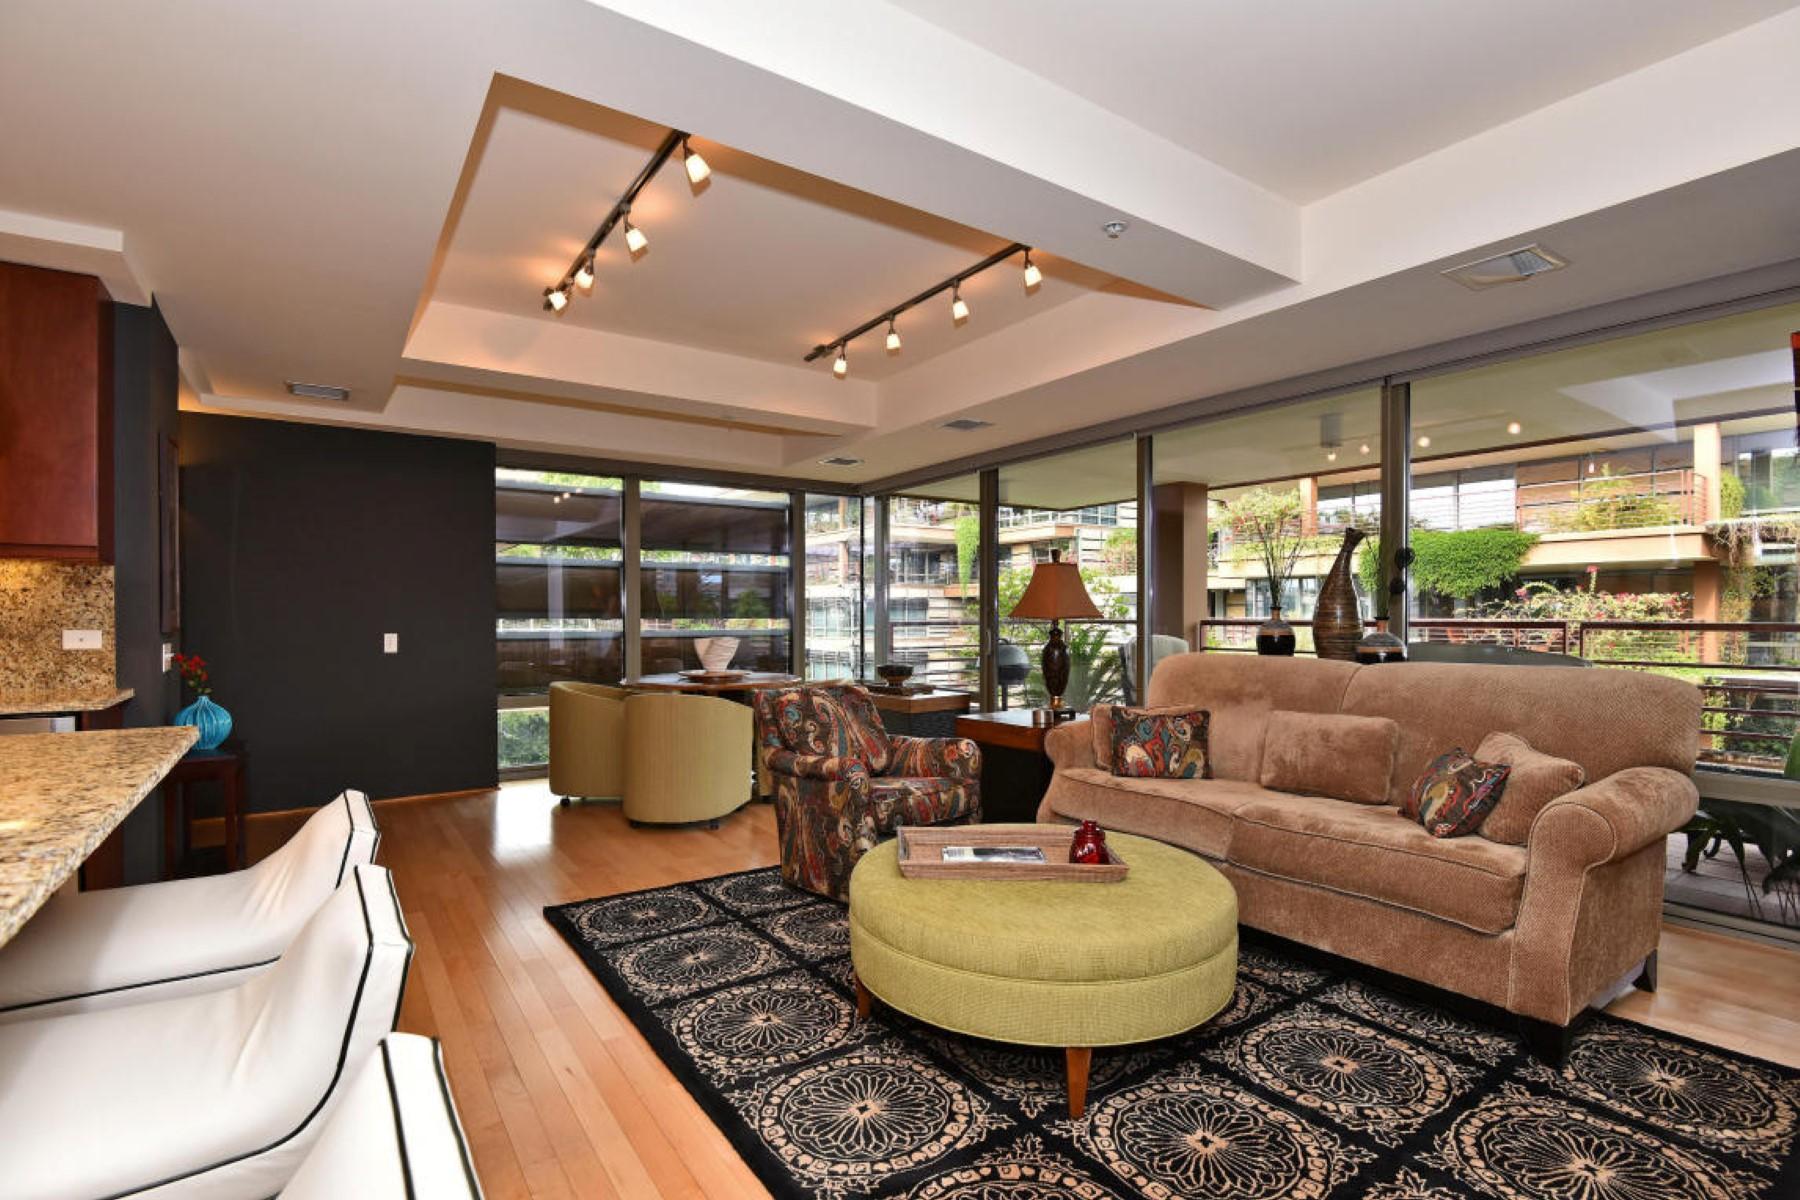 Apartamento por un Venta en Tranquility and serenity of interior living at Optima 7147 E Rancho Vista Dr #5006 Scottsdale, Arizona 85251 Estados Unidos